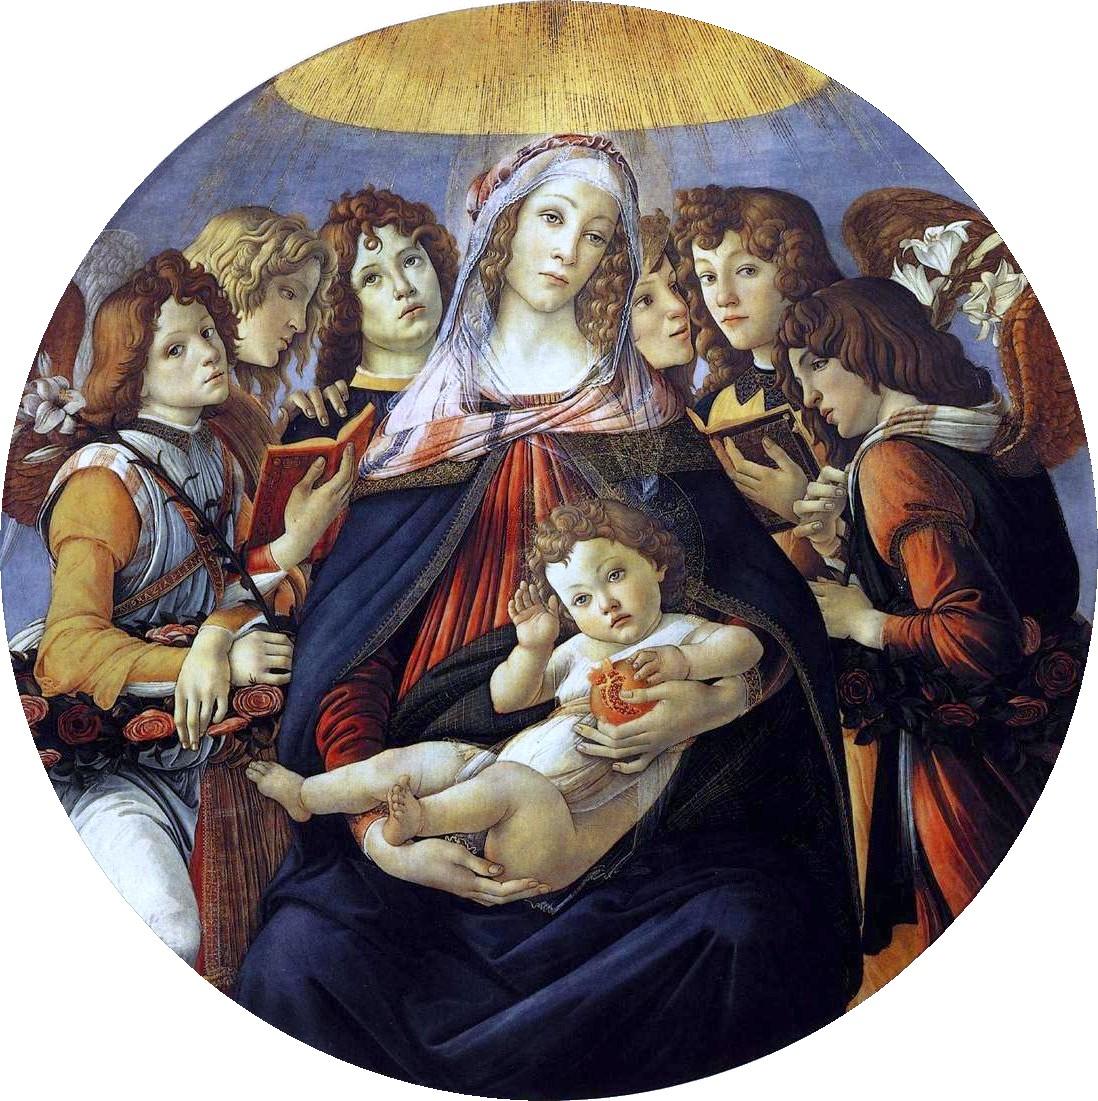 http://upload.wikimedia.org/wikipedia/commons/b/bc/Botticelli%2C_madonna_della_melagrana_01.jpg